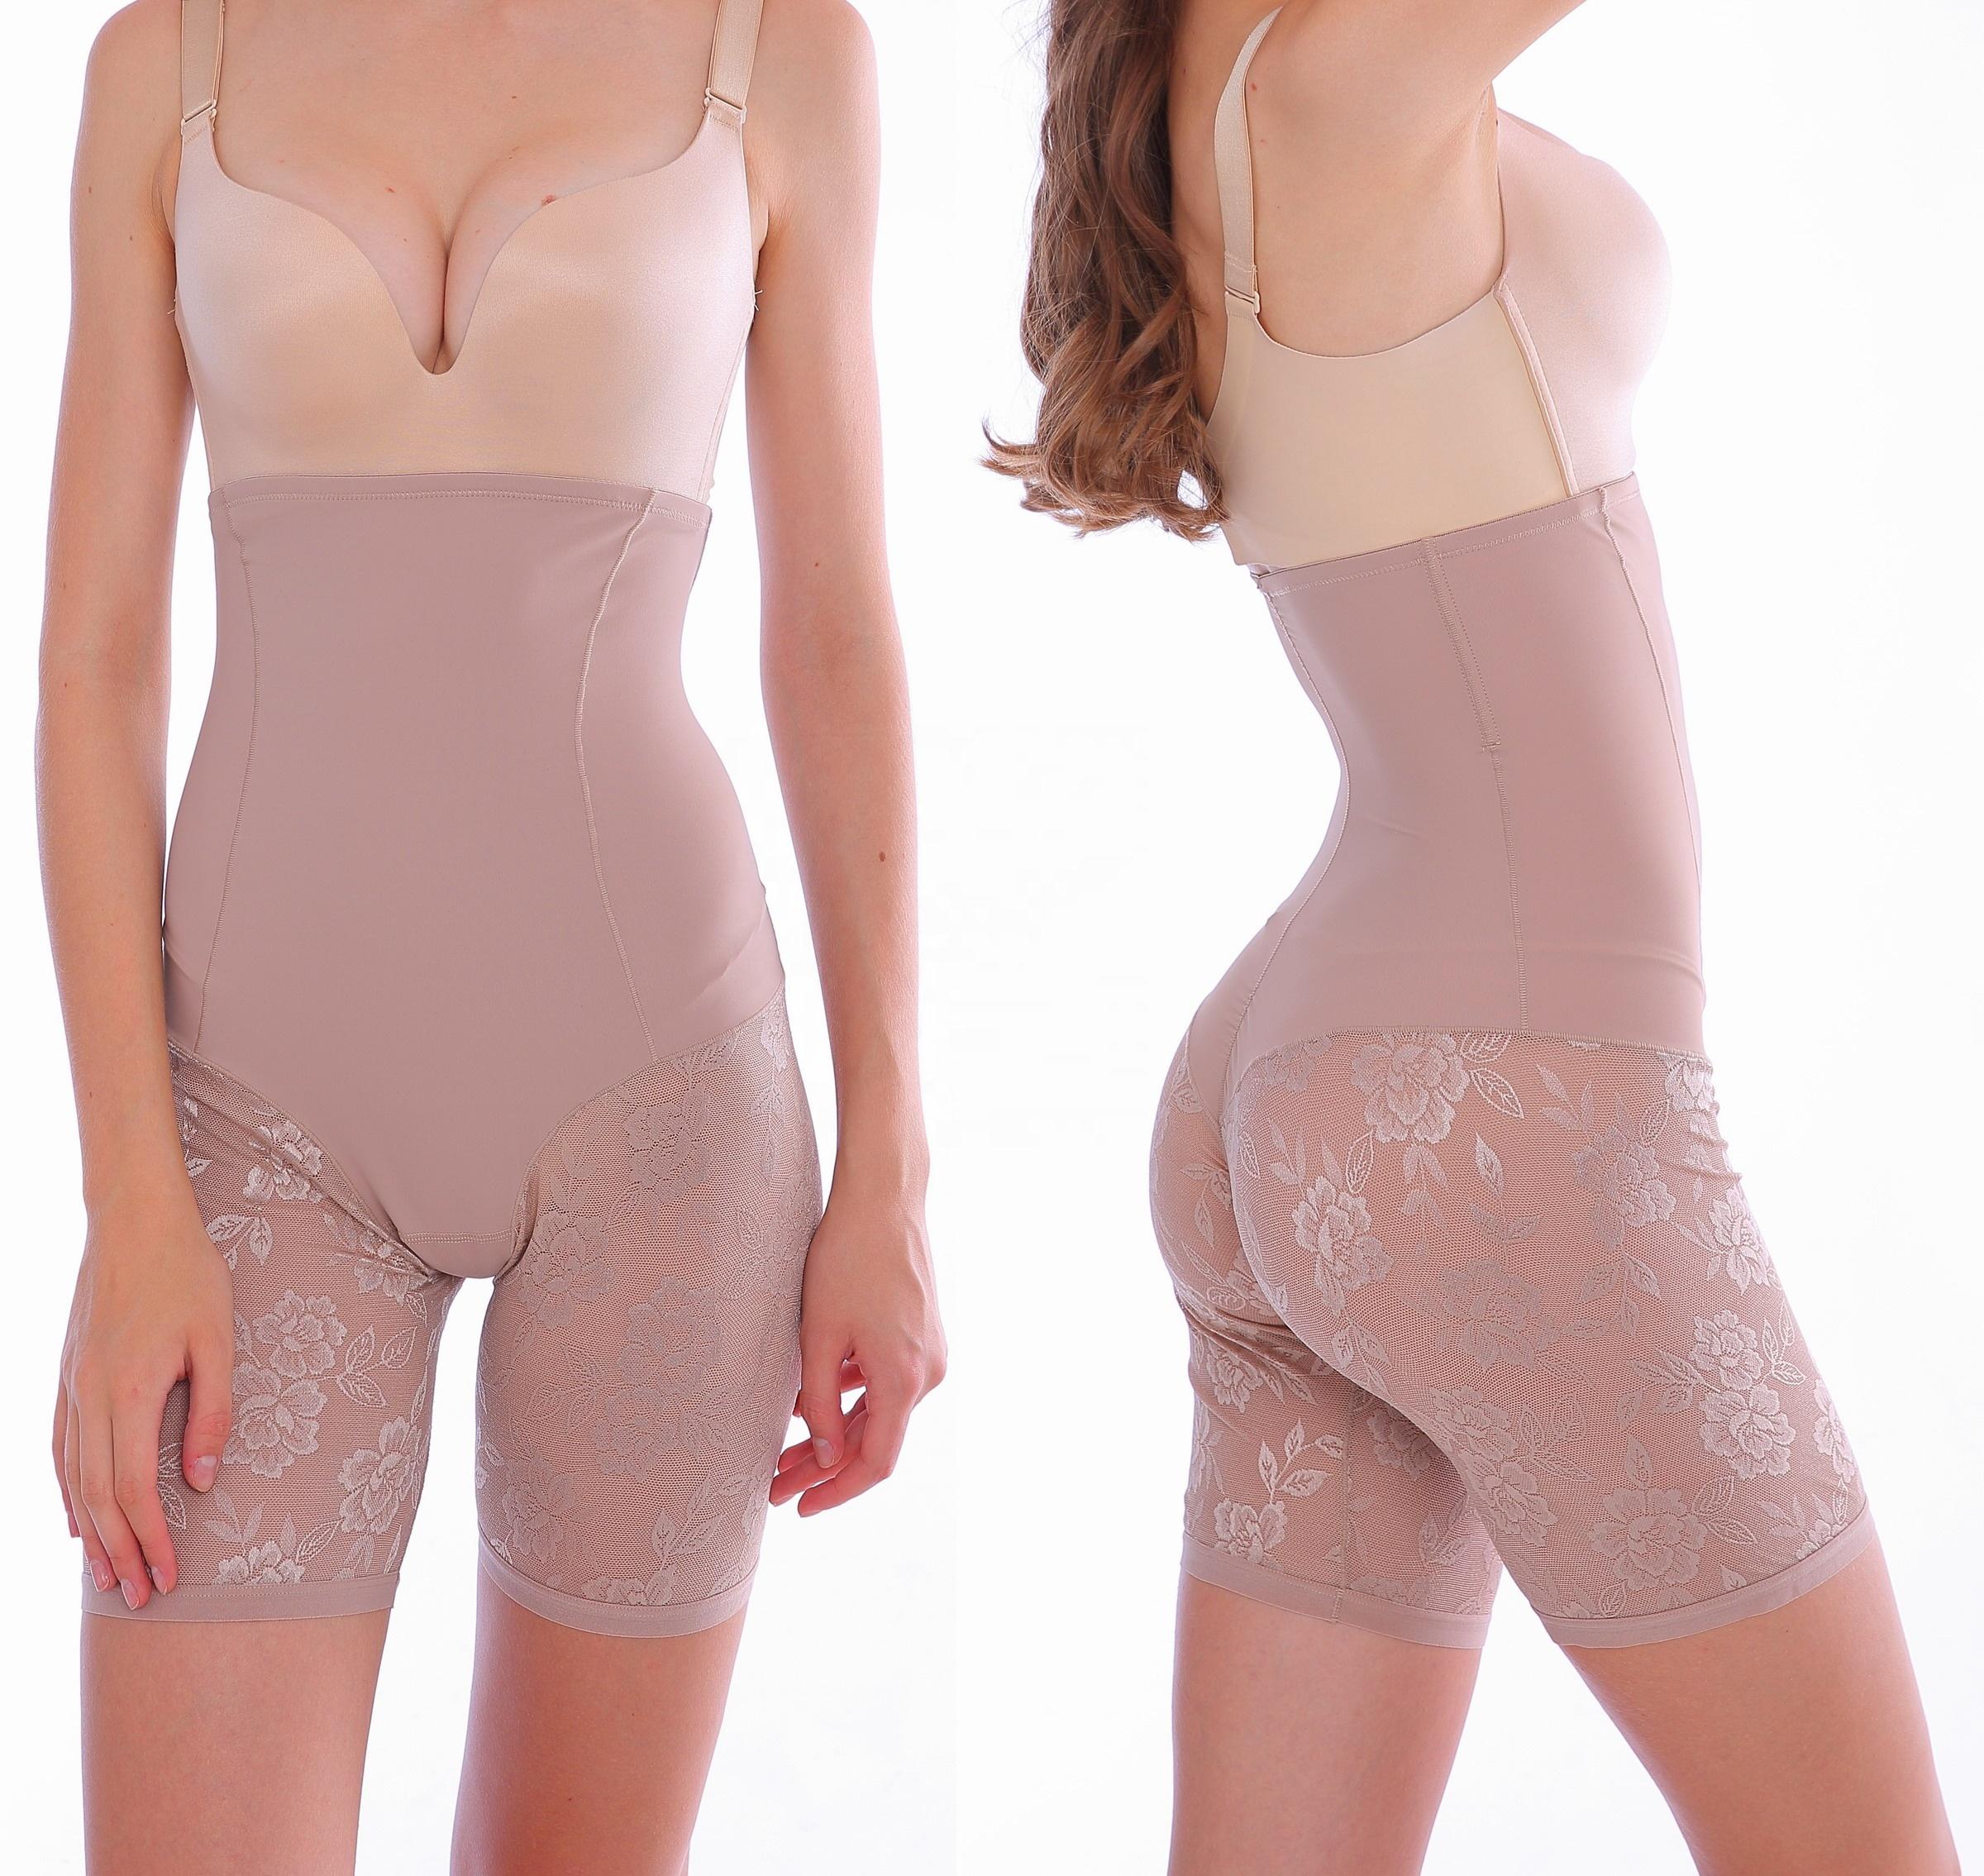 New lace women shapewear panties high waist tummy control short lace waist slim shaper panties фото